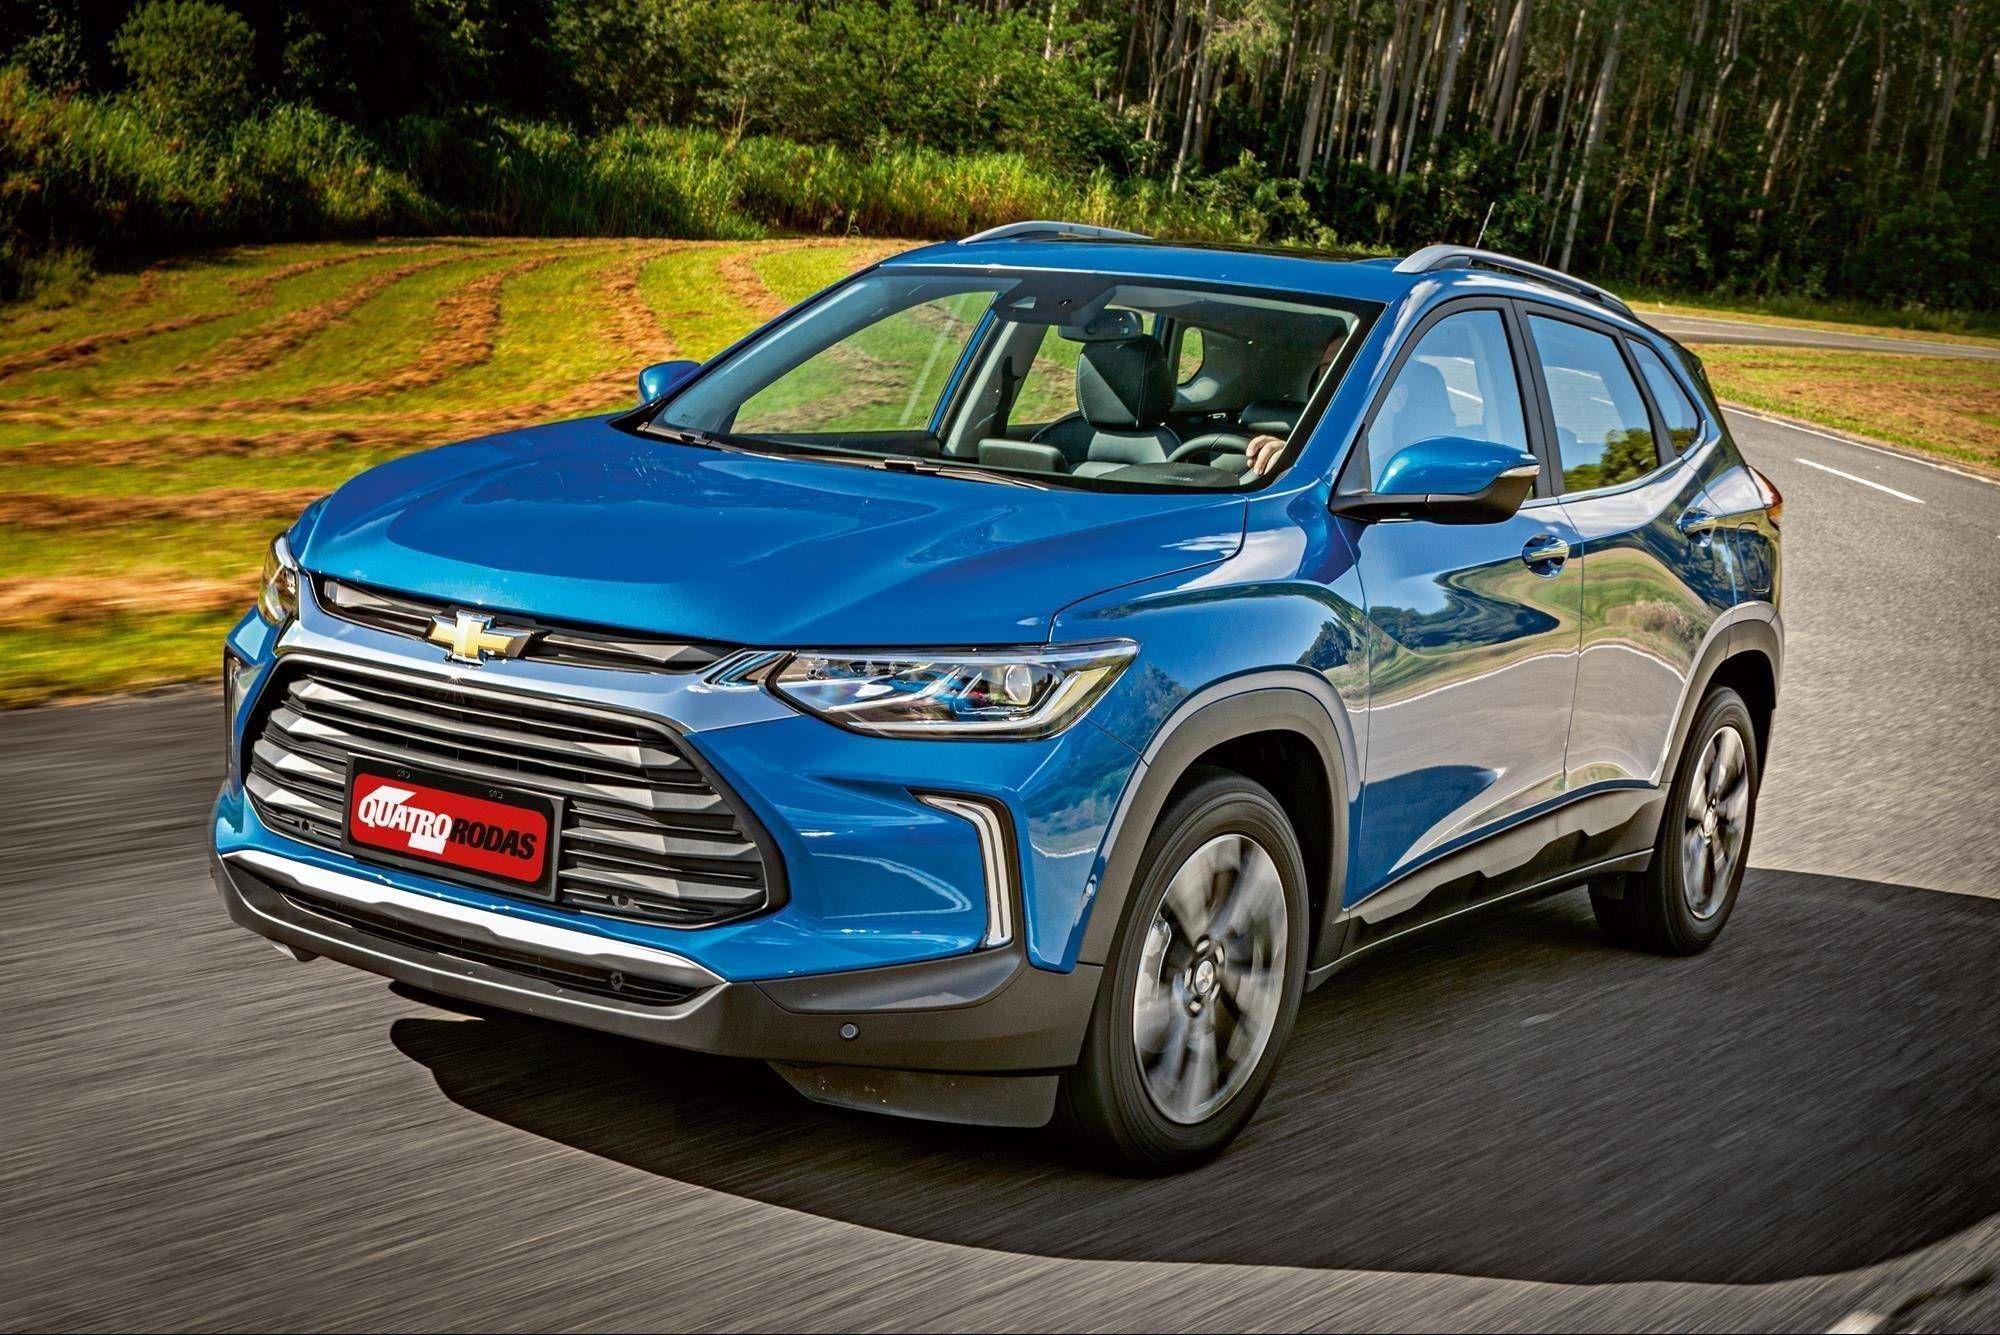 Chevrolet Tracker Premier 1 2 2021 1 Em 2020 Suv Jeep Renegade Chevrolet Cruze